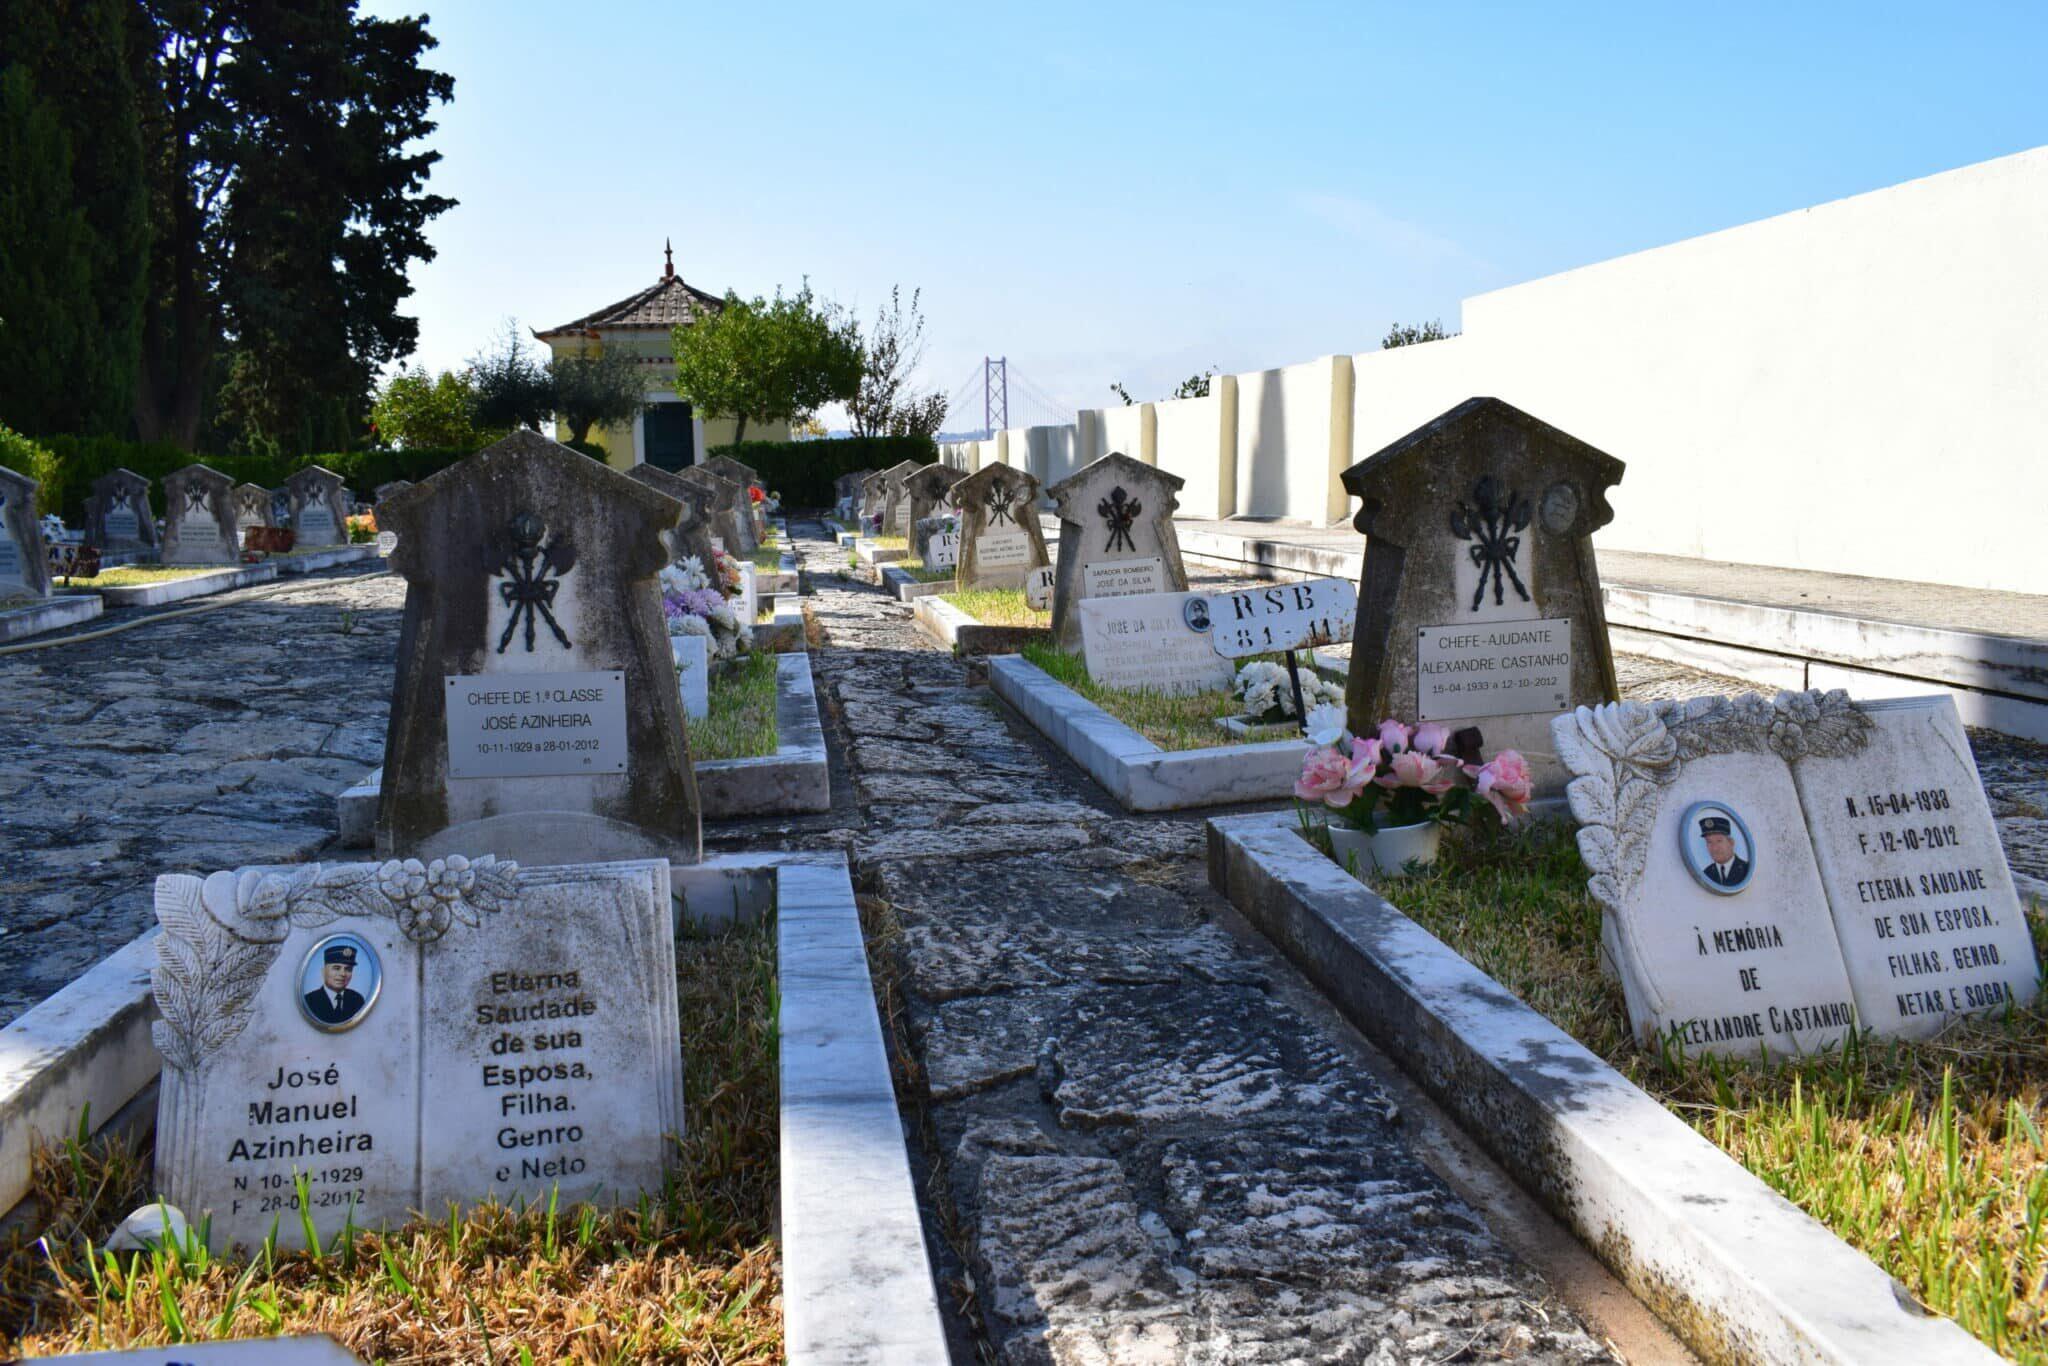 Cemetery Prazeres 4